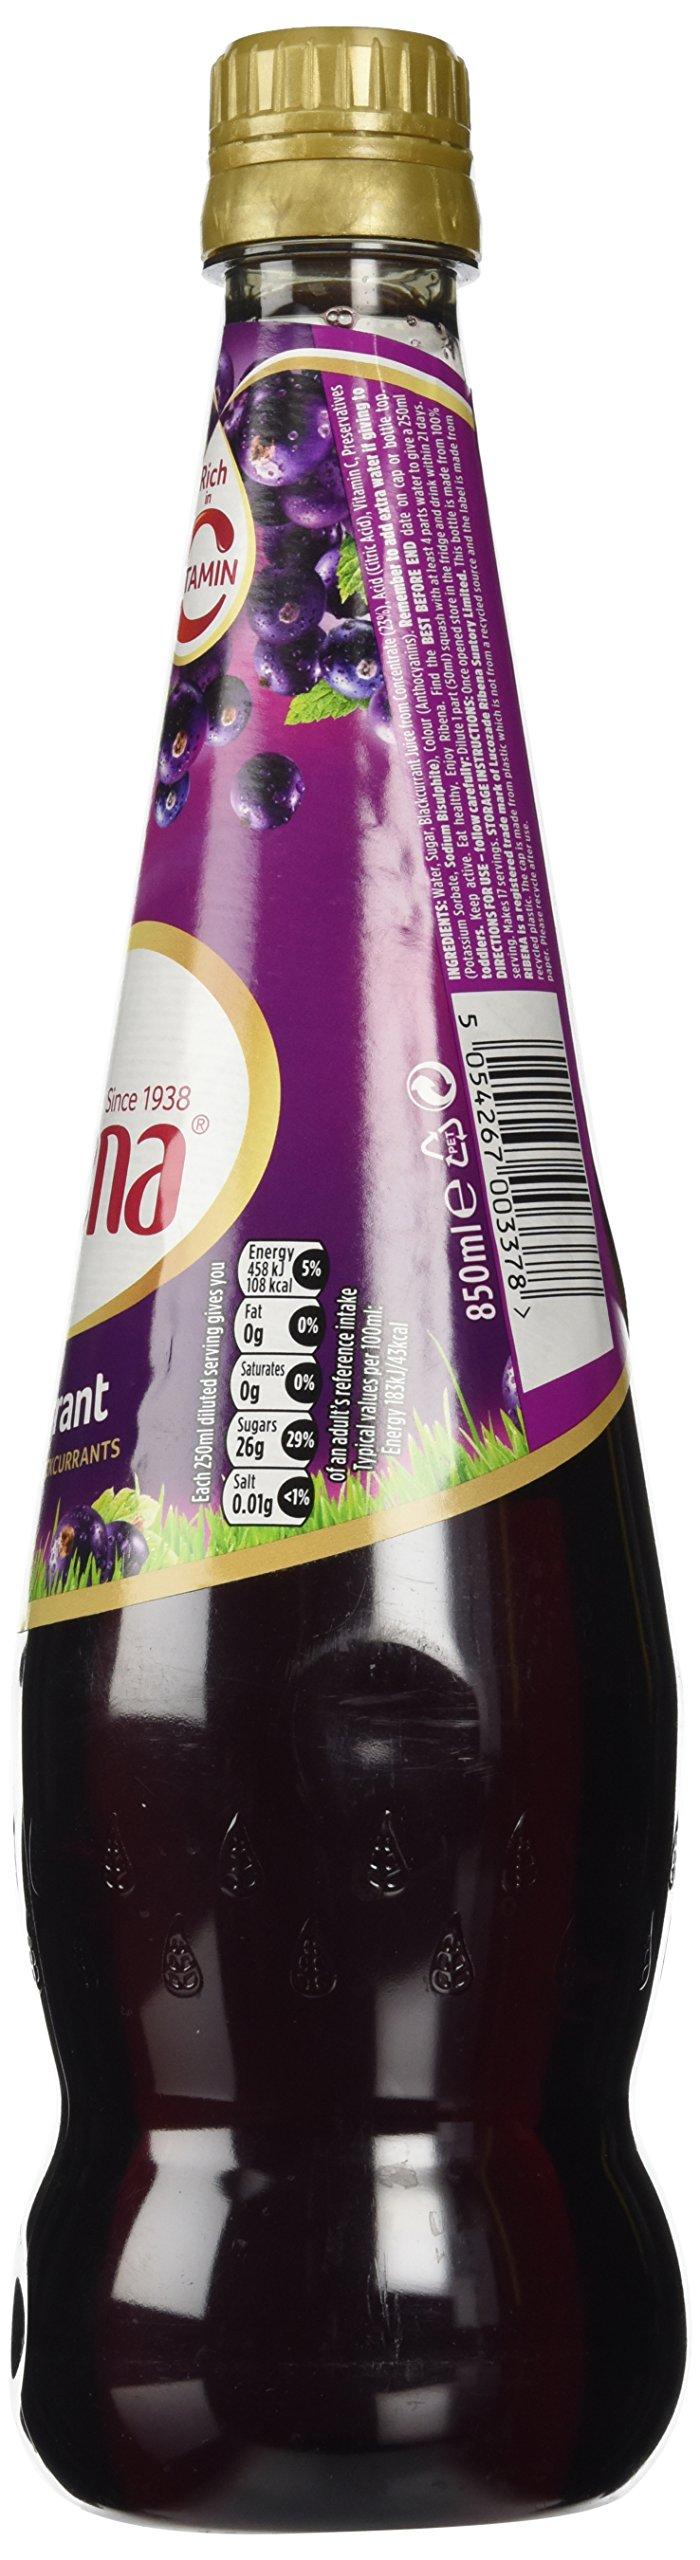 Ribena Blackcurrant Juice 28.74 Ounce